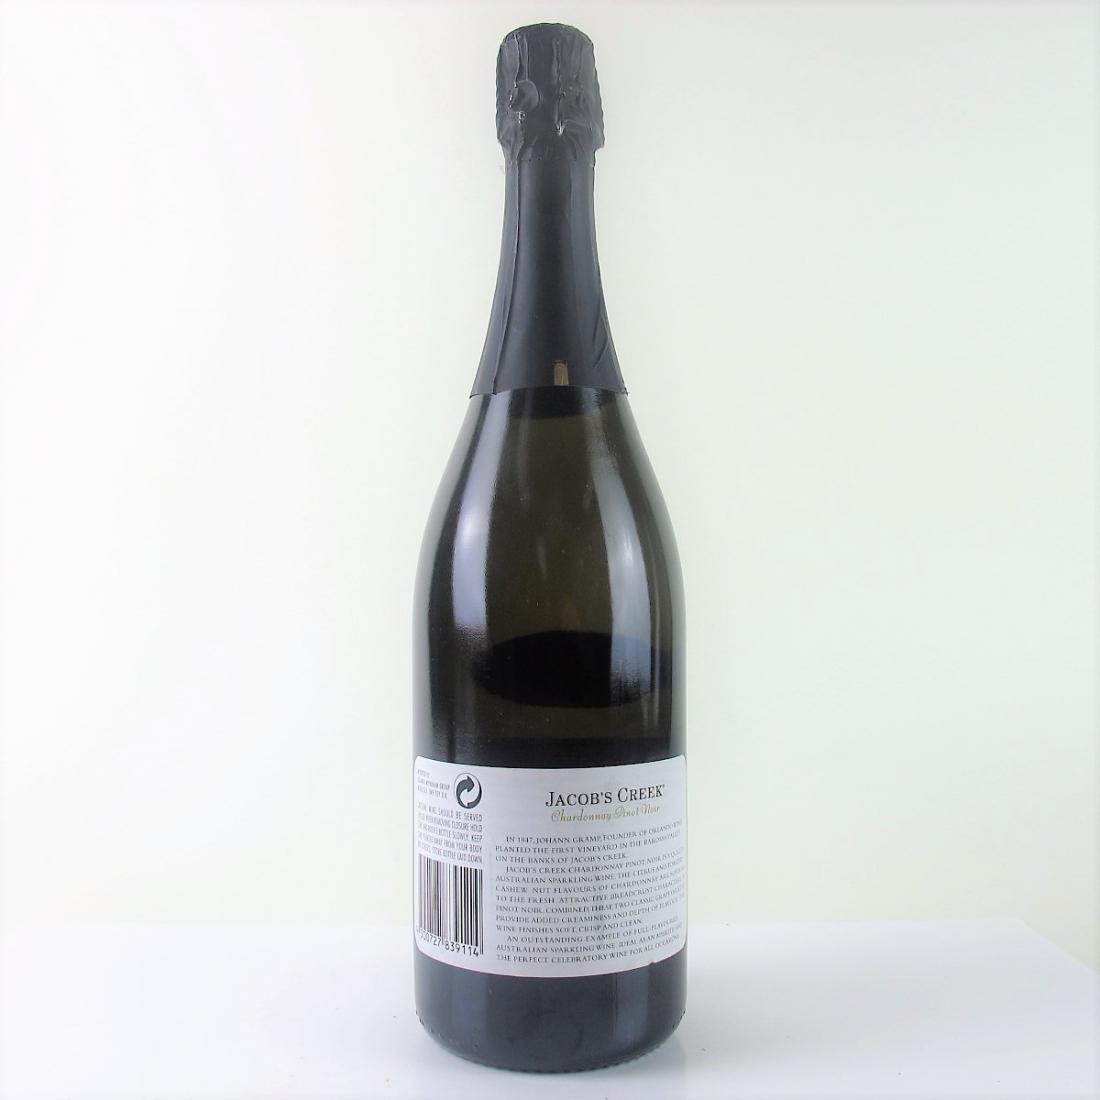 Jacob's Creek Australian Sparkling Wine